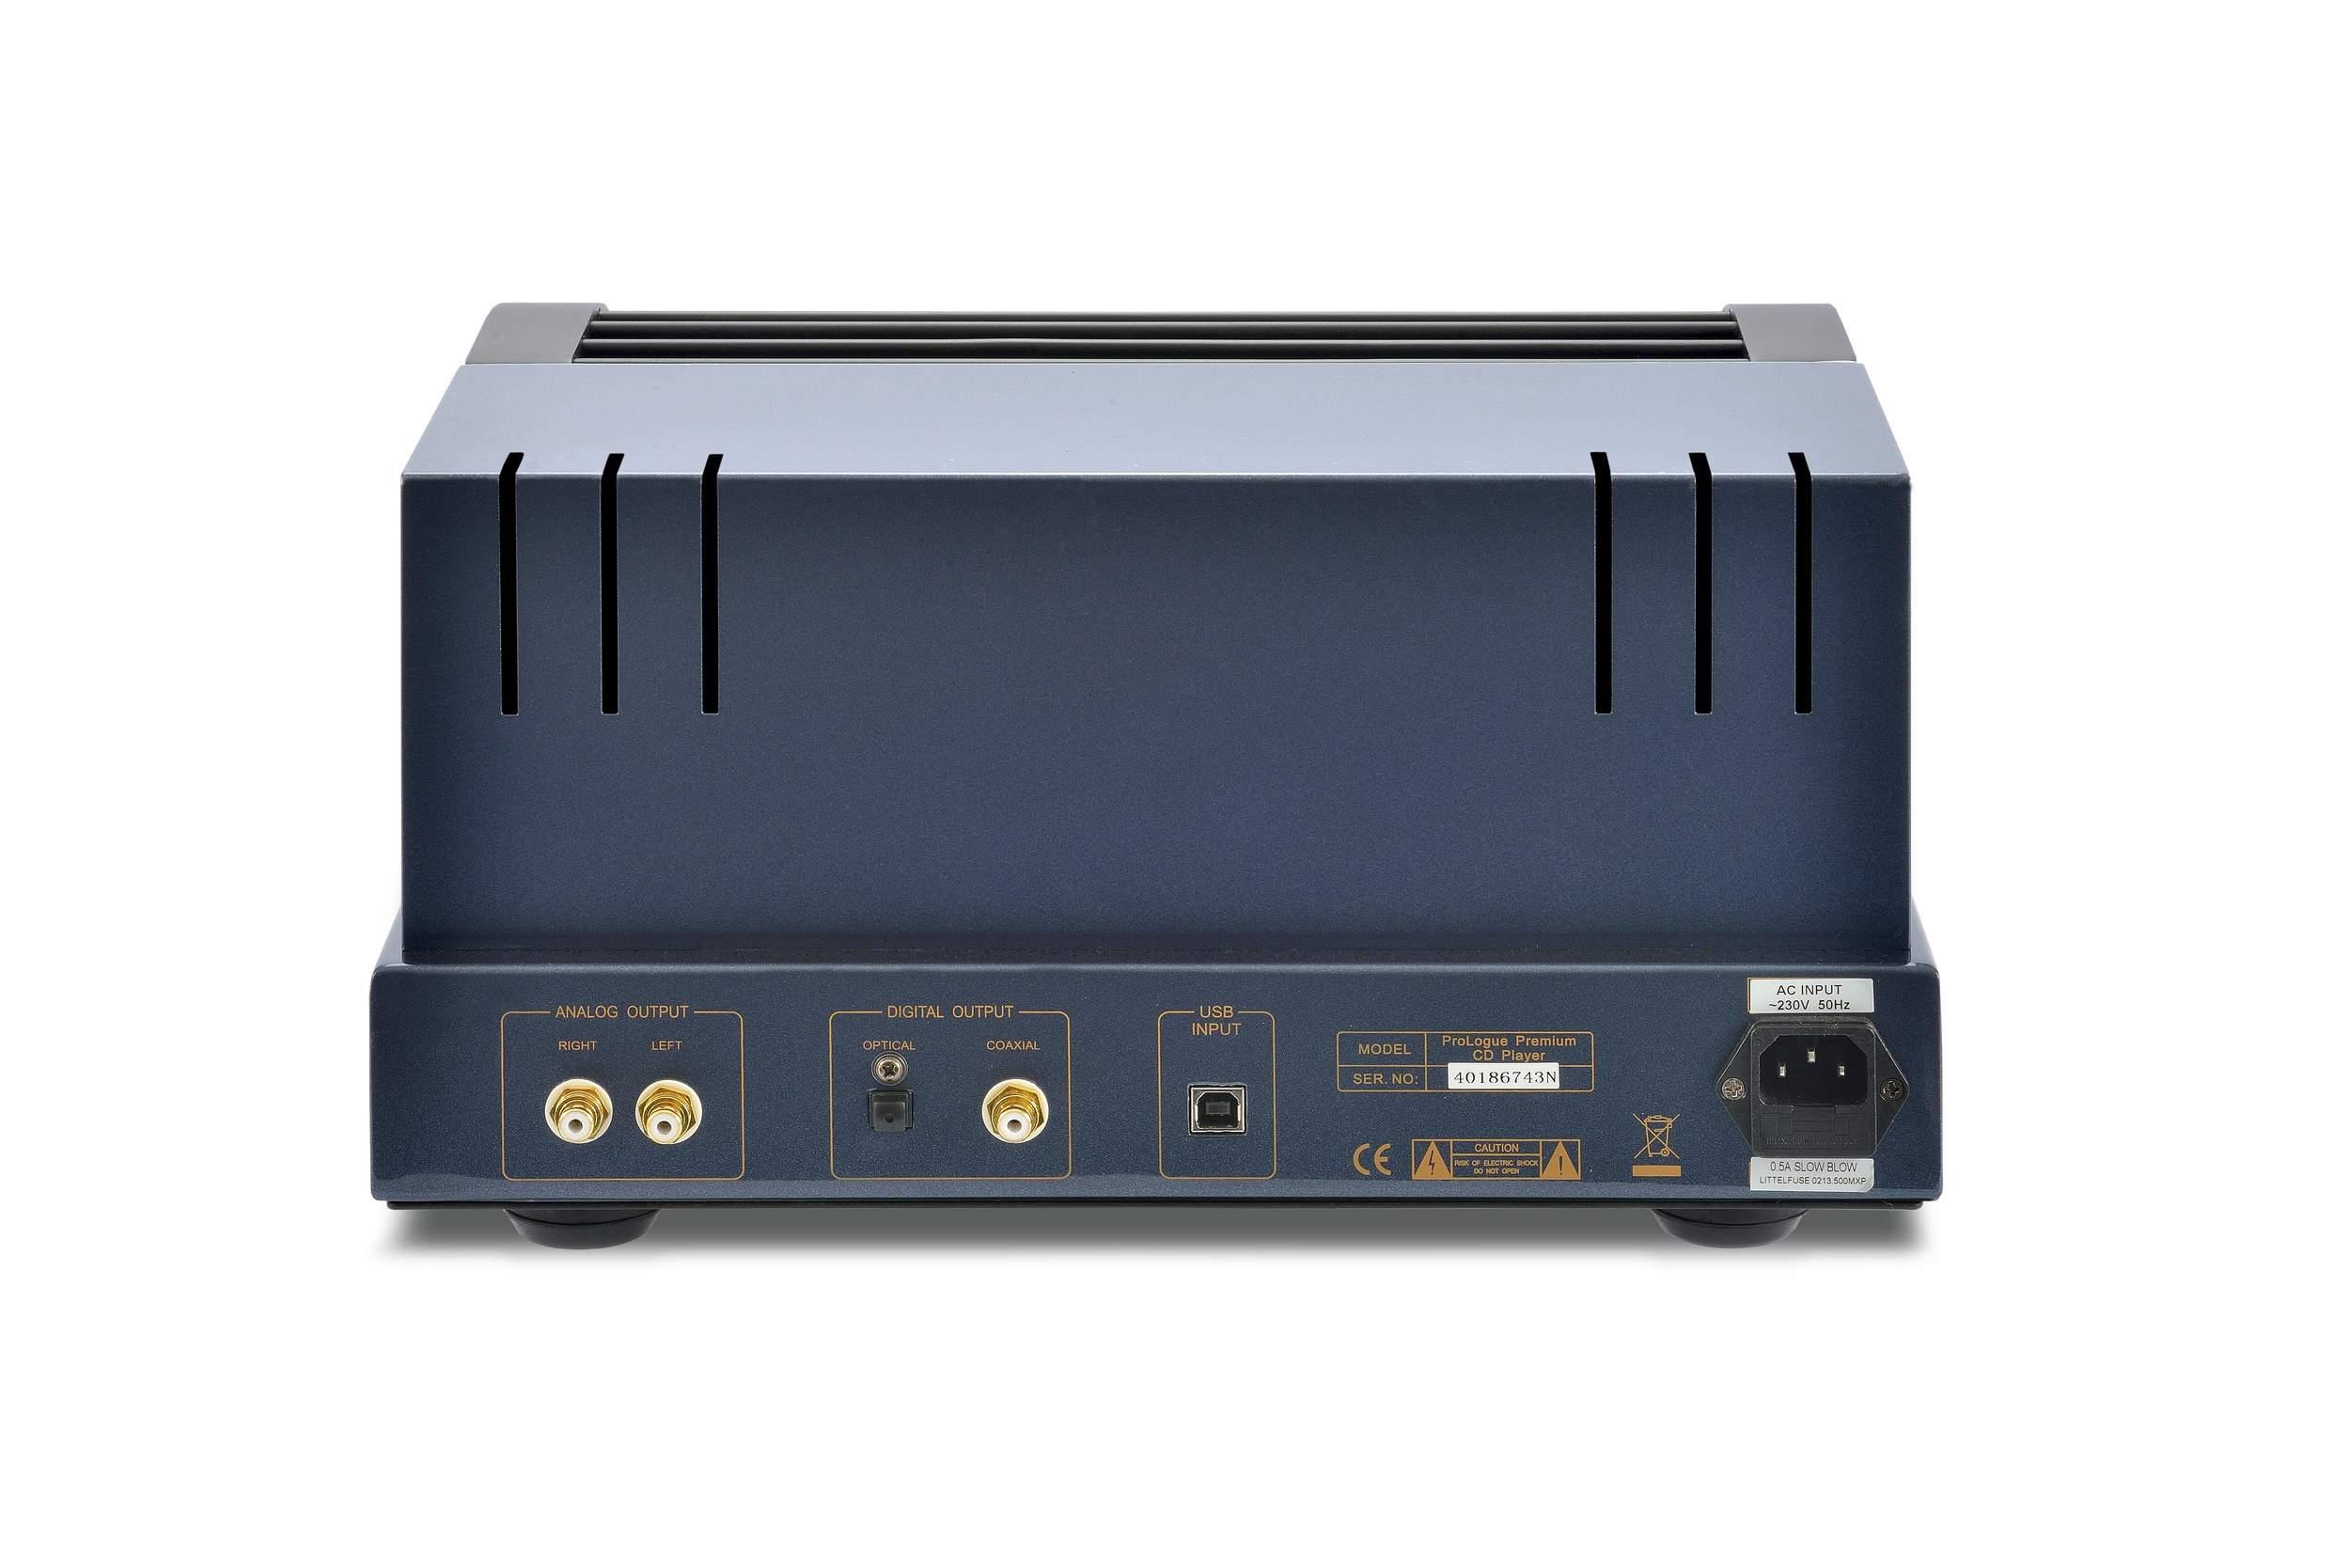 019 - PrimaLuna Prologue Premium CD Player Silver-high res.jpg